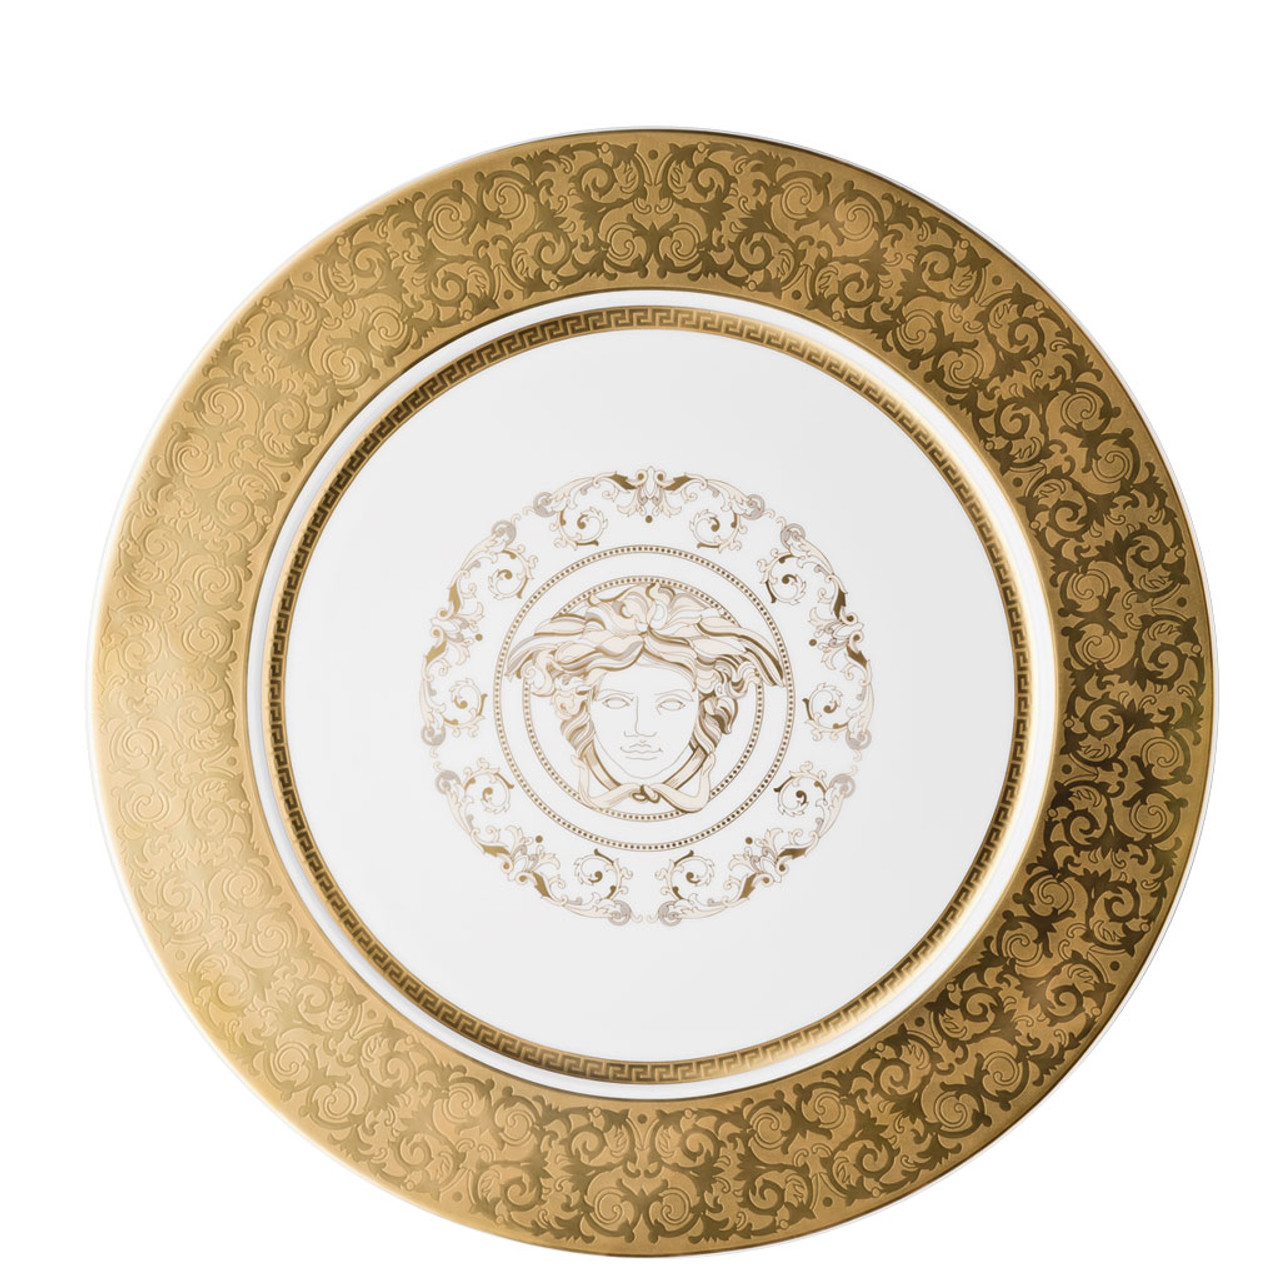 Service Plate, 13 inch | Medusa Gala Gold| Rosenthal Shop